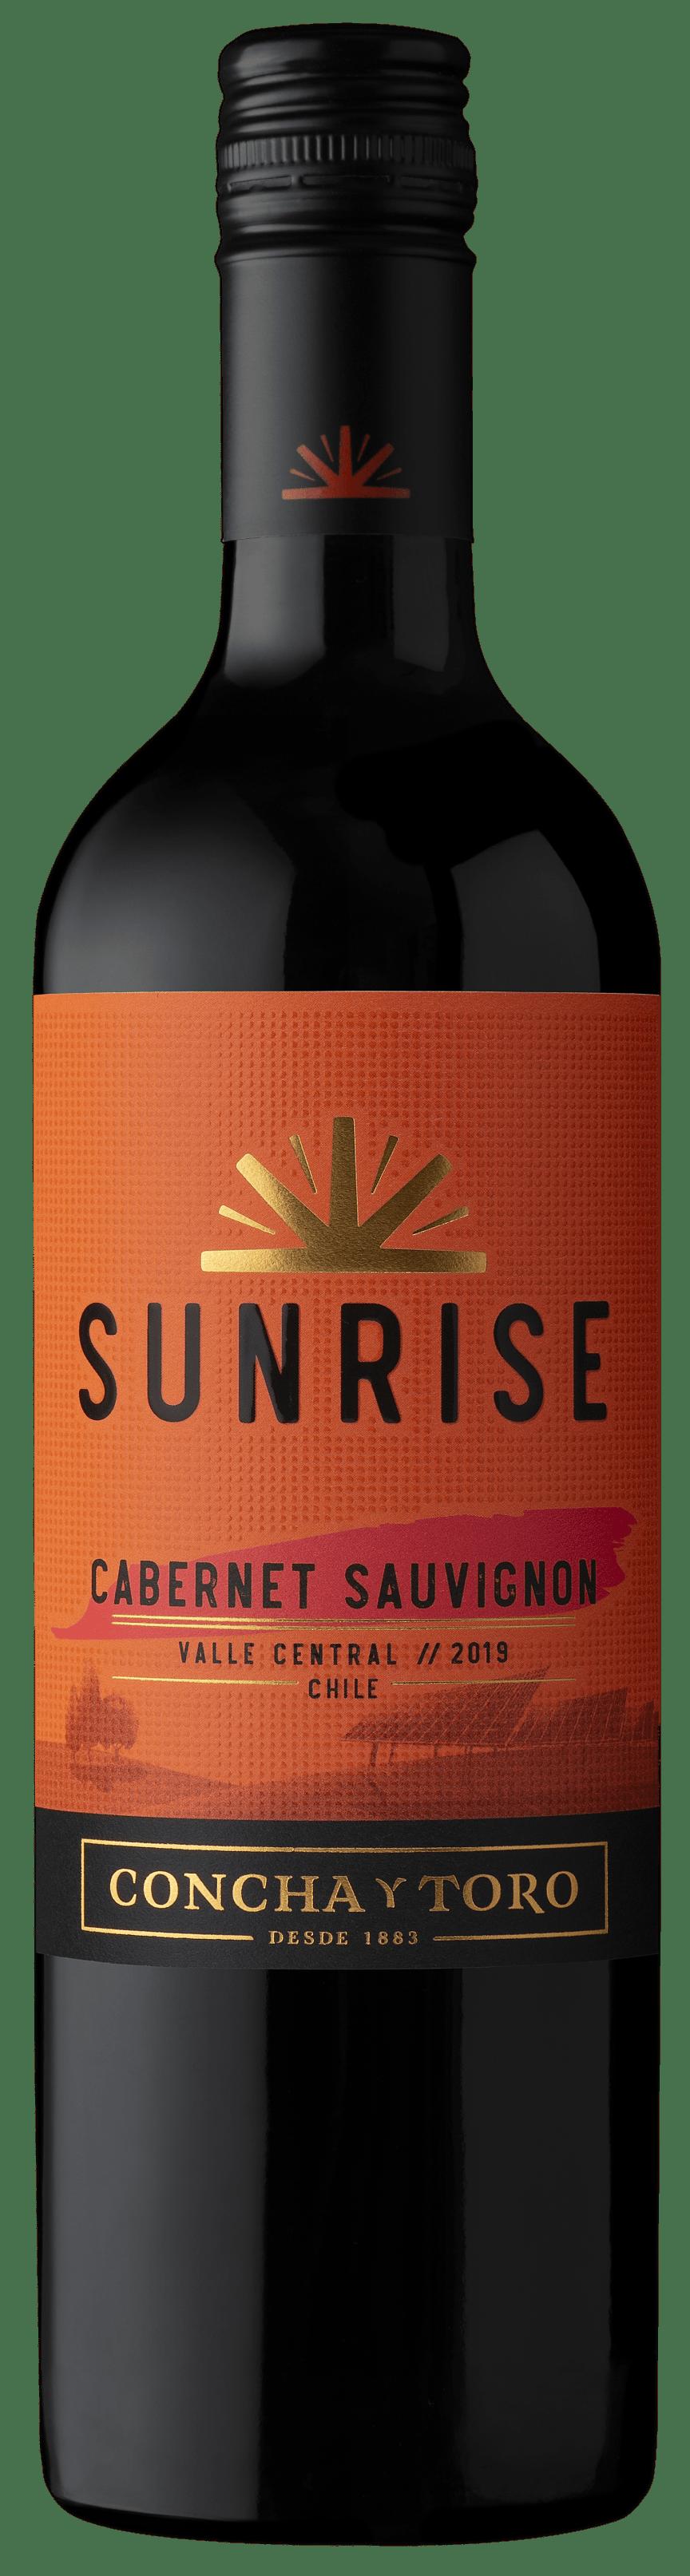 Sunrise Cabernet Sauvignon, art. 16676-01